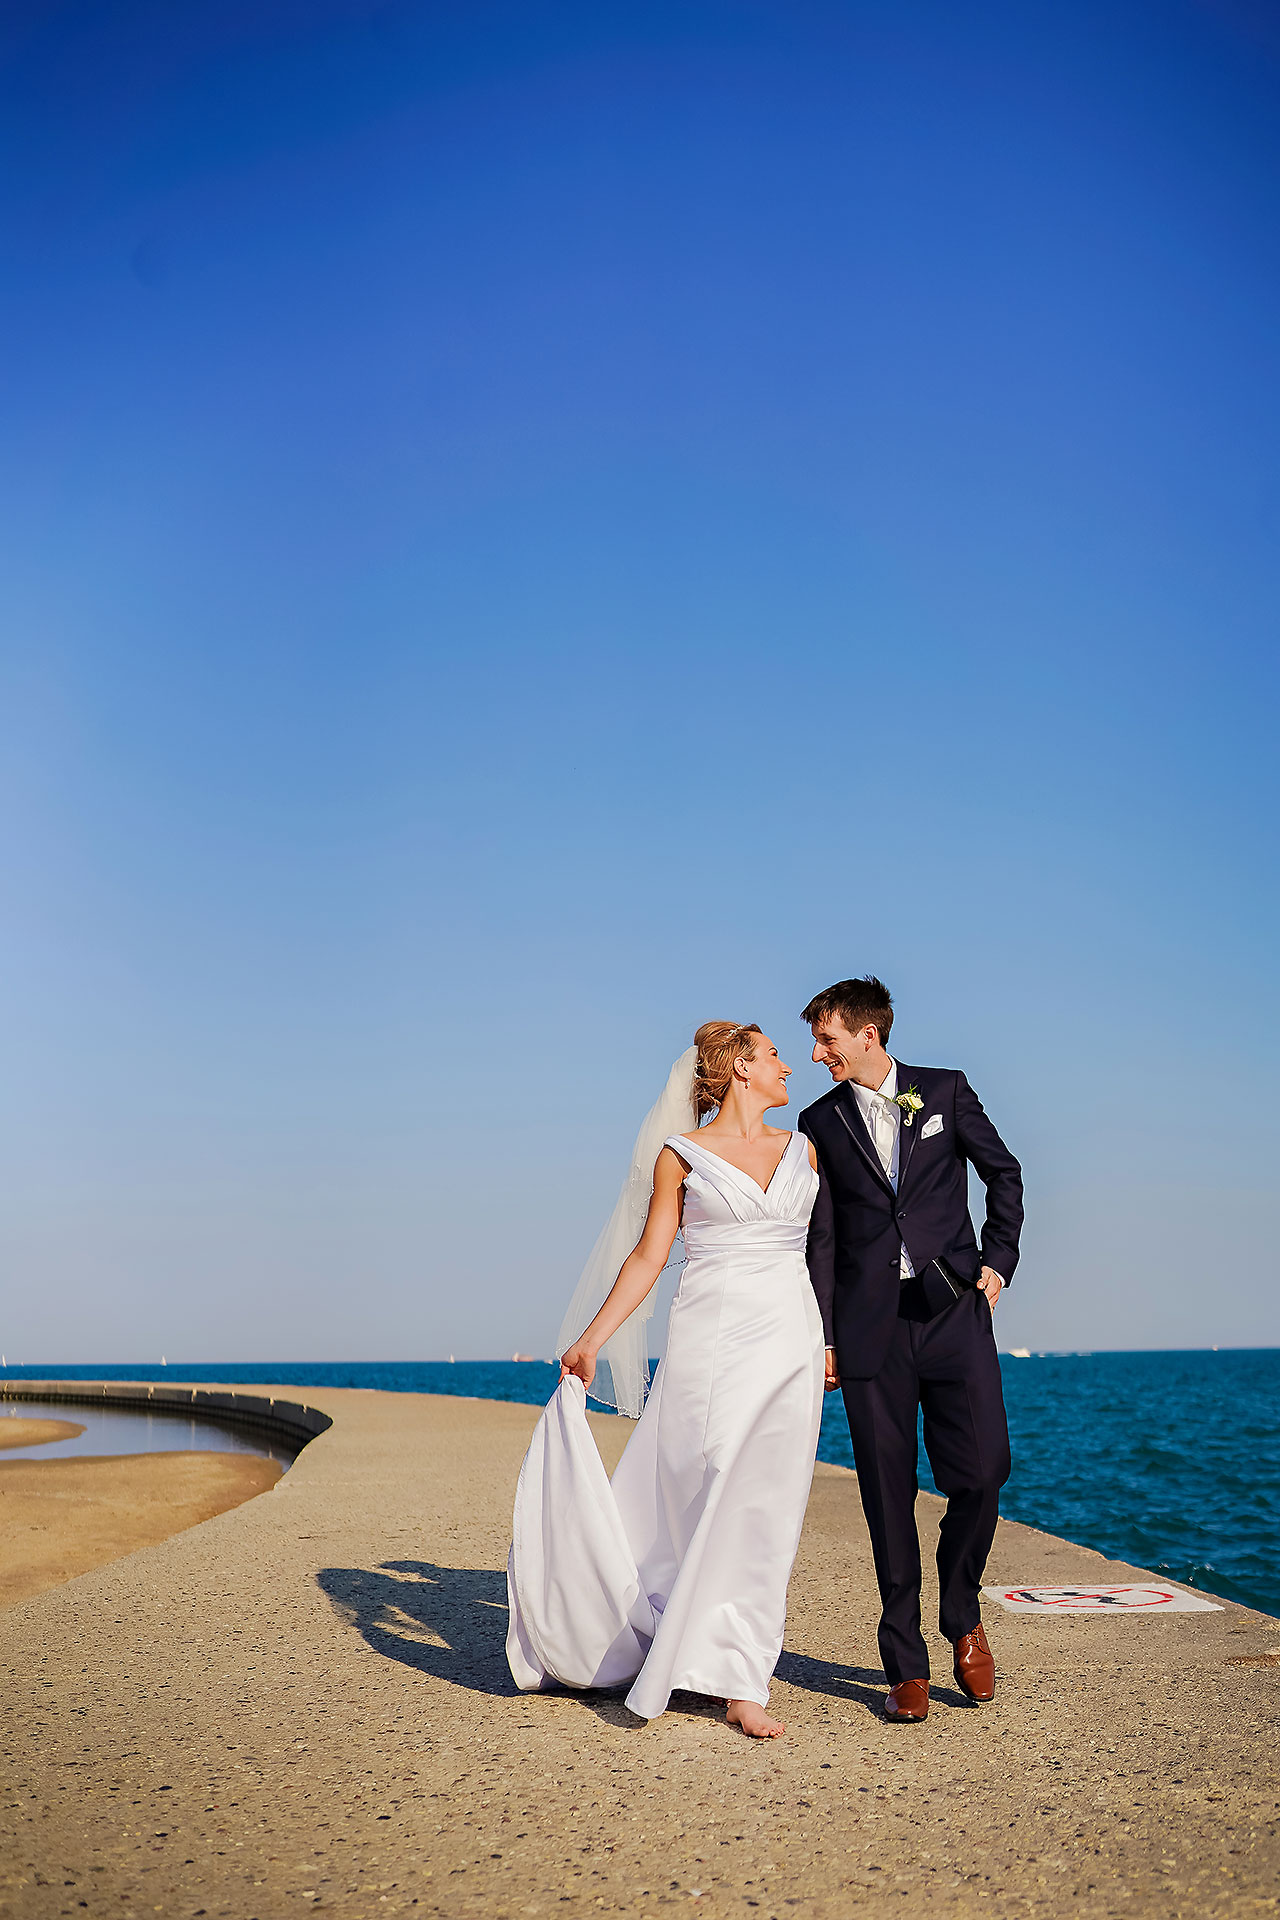 Jaclyn Matt Odessy Chicago River Cruise Wedding 095